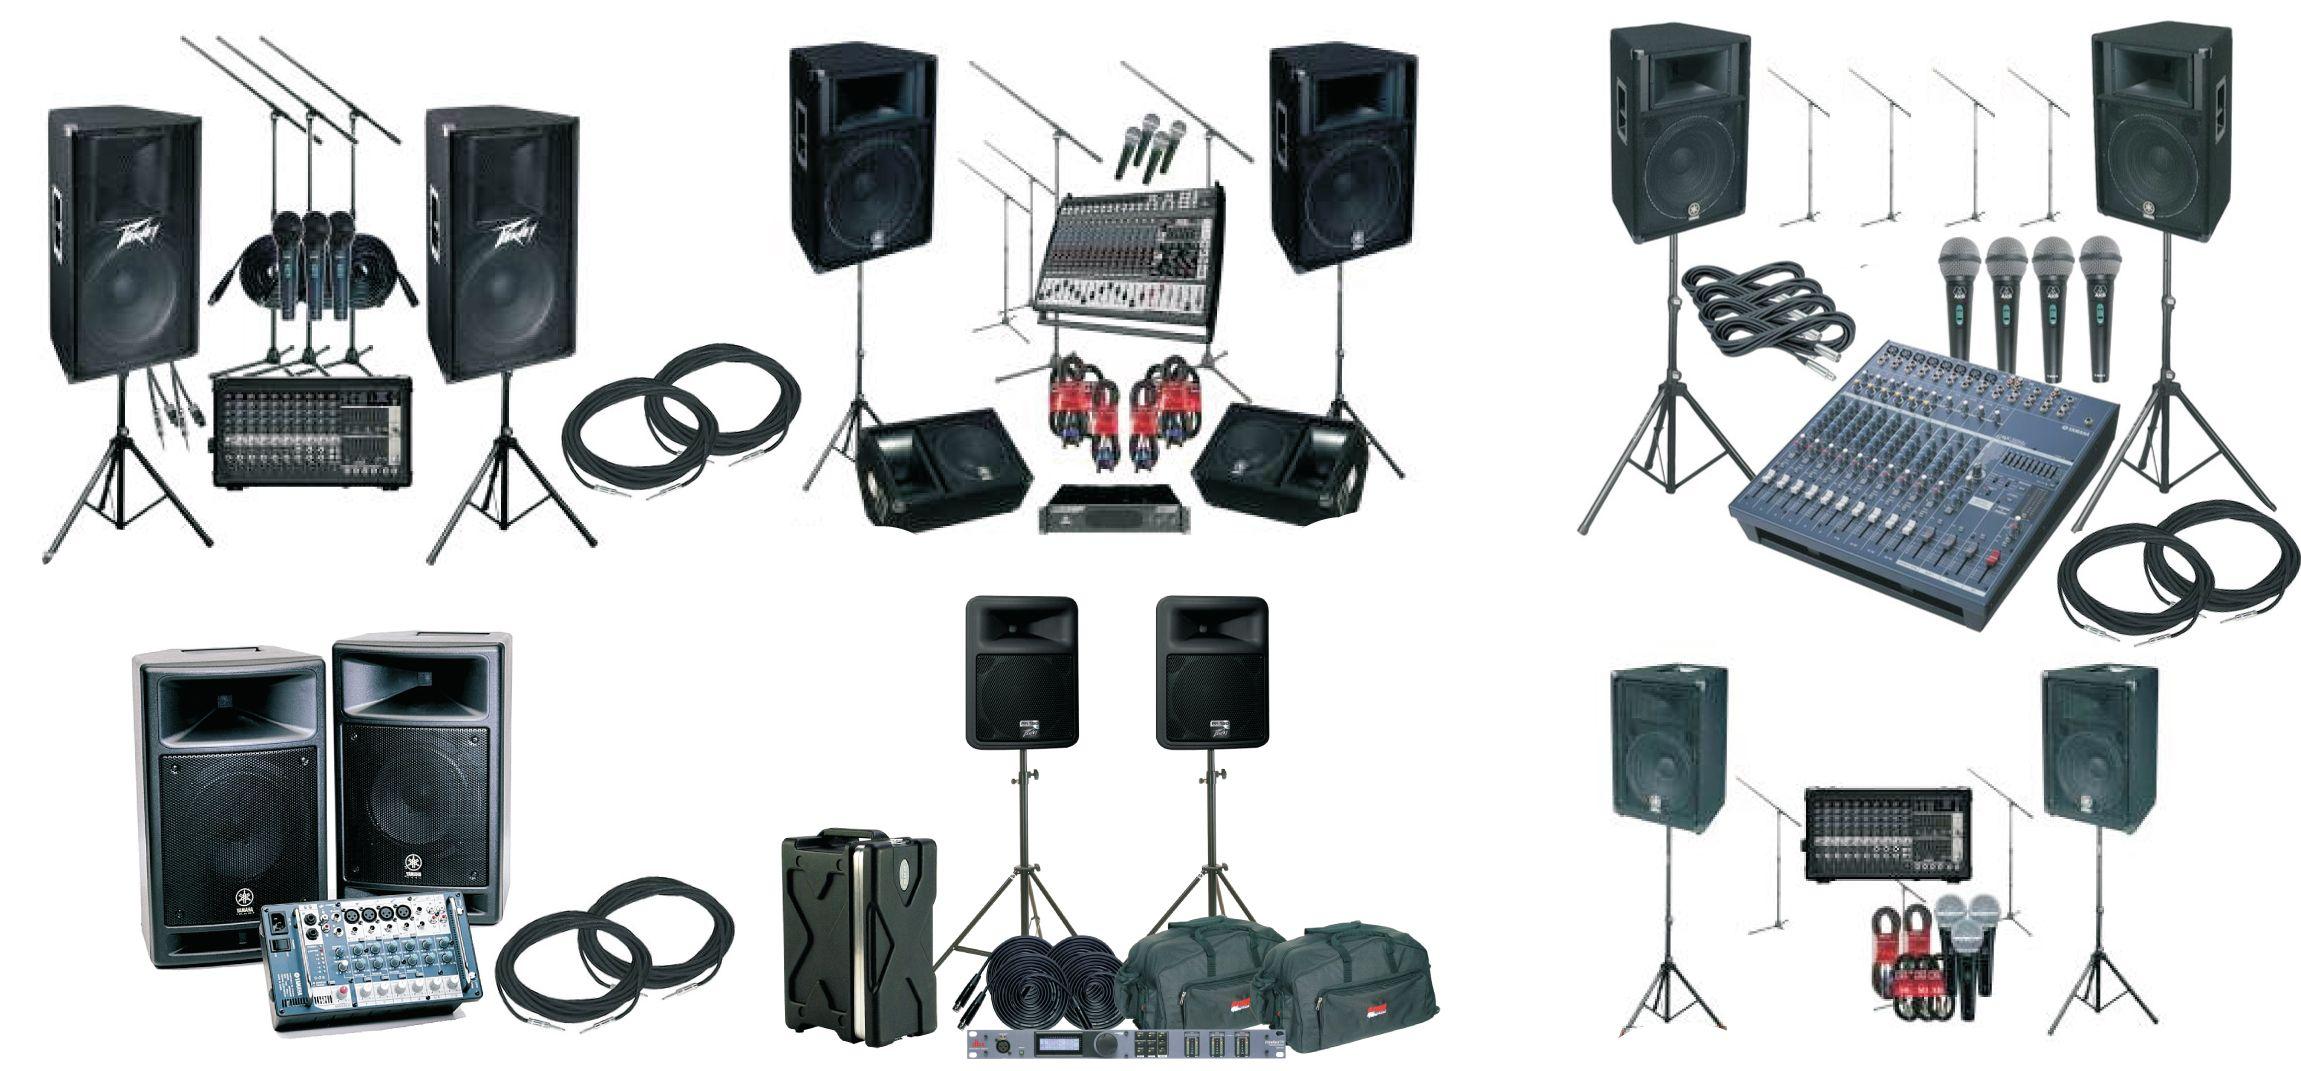 Empire av offers best quality of sound equipment and dj